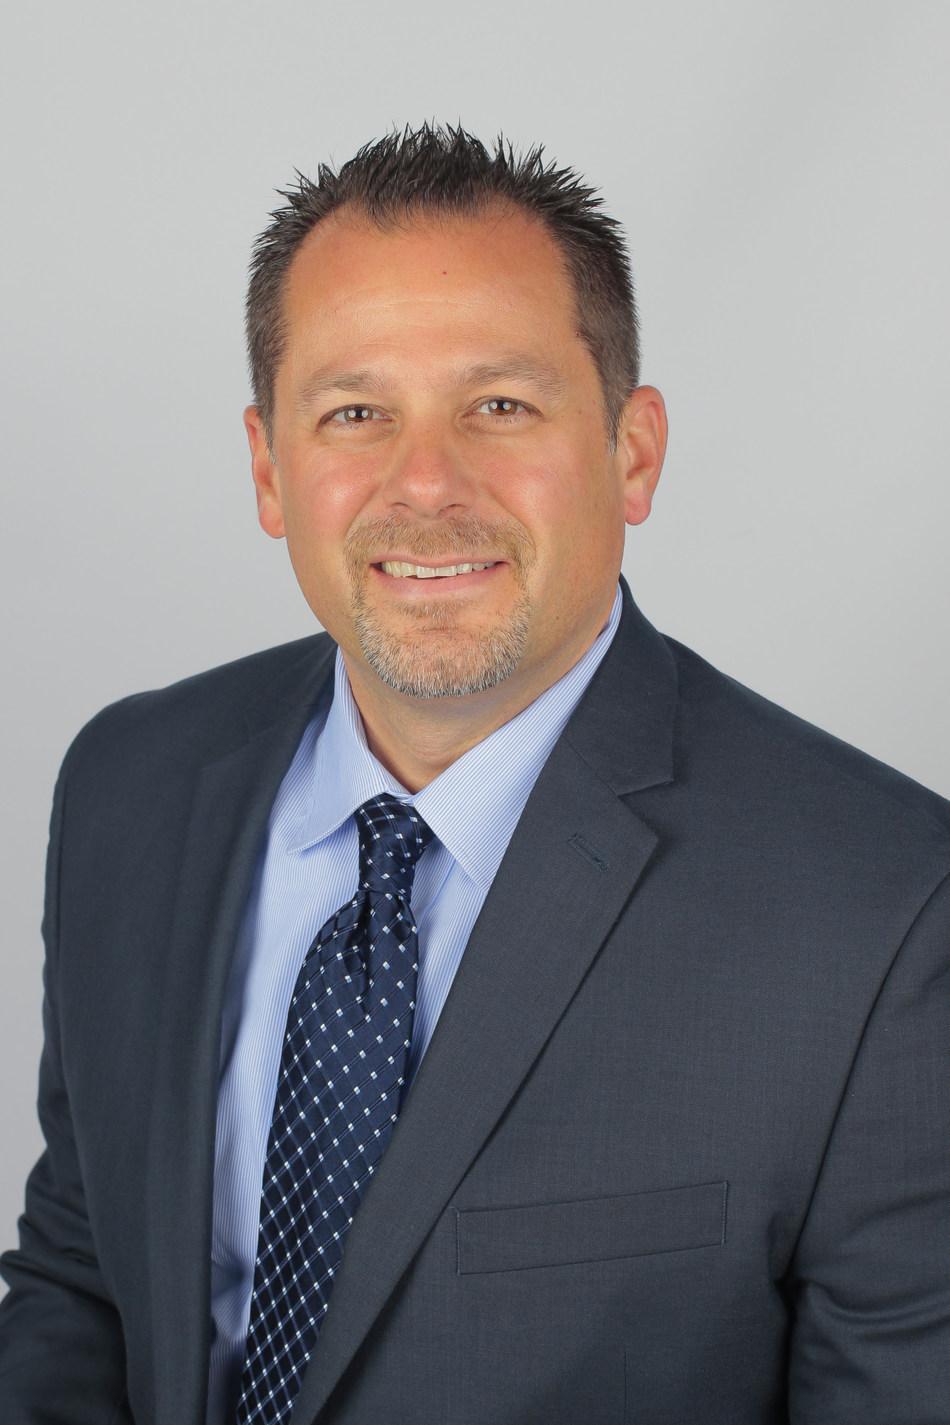 Michael Mahfet, CEO, Ascent Aerospace